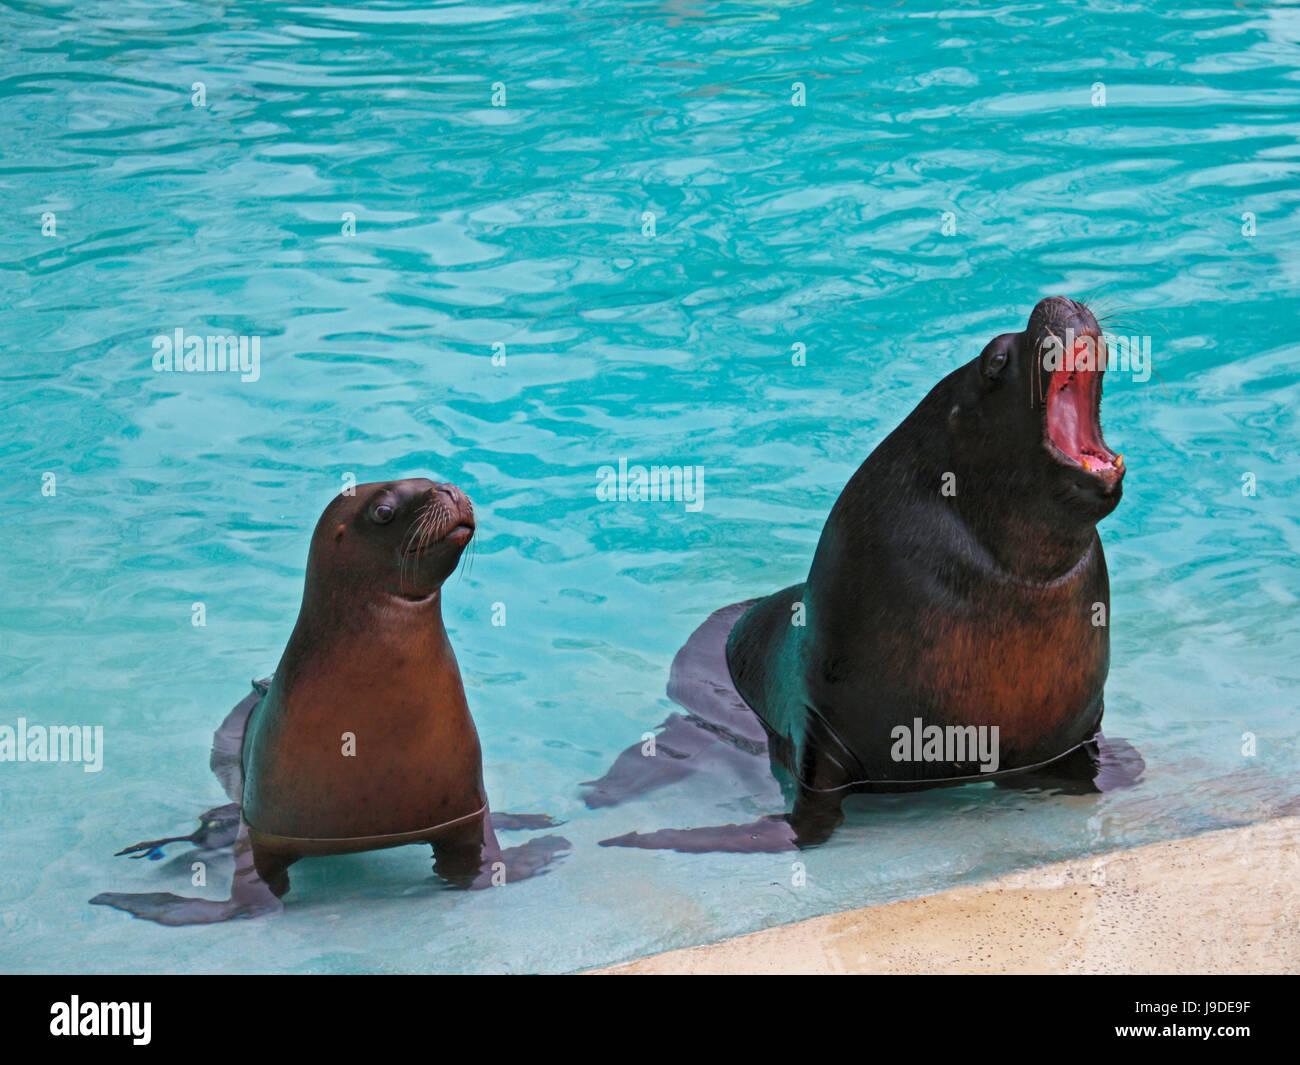 crawl, sea lion, animal, mammal, brown, brownish, brunette, hunter, location Stock Photo